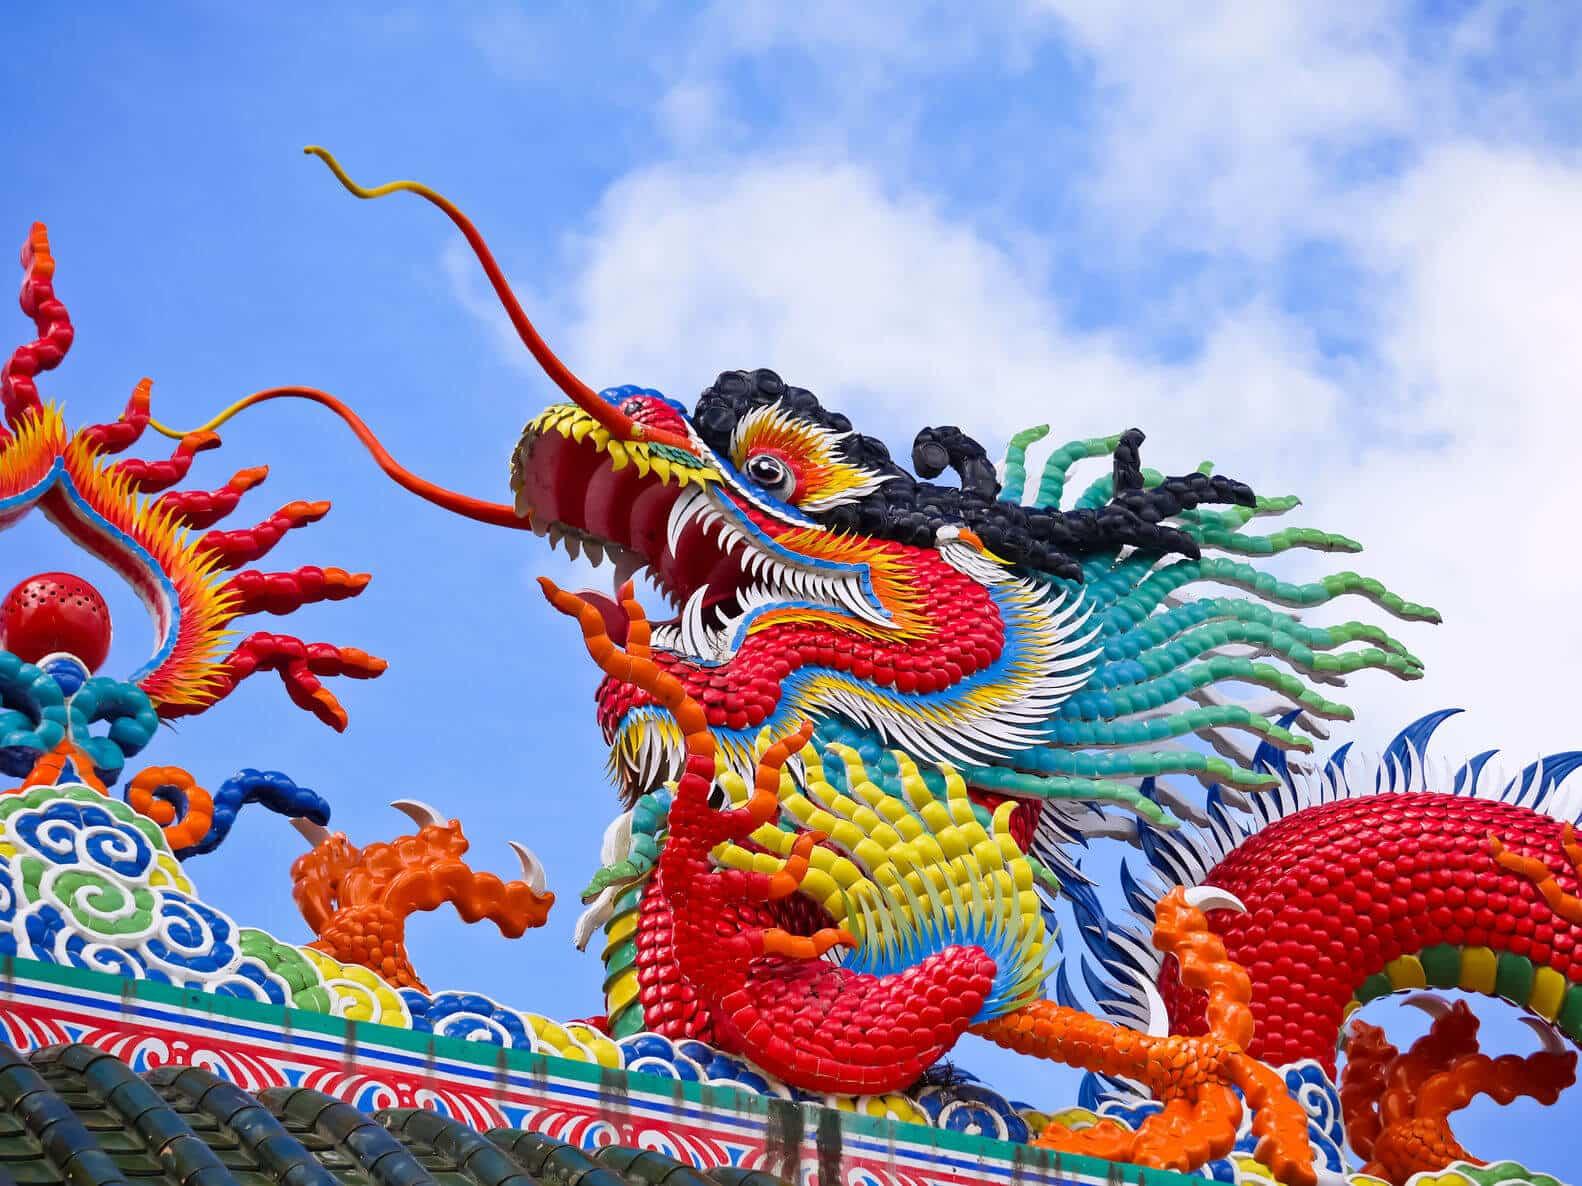 Dragon in the bond market